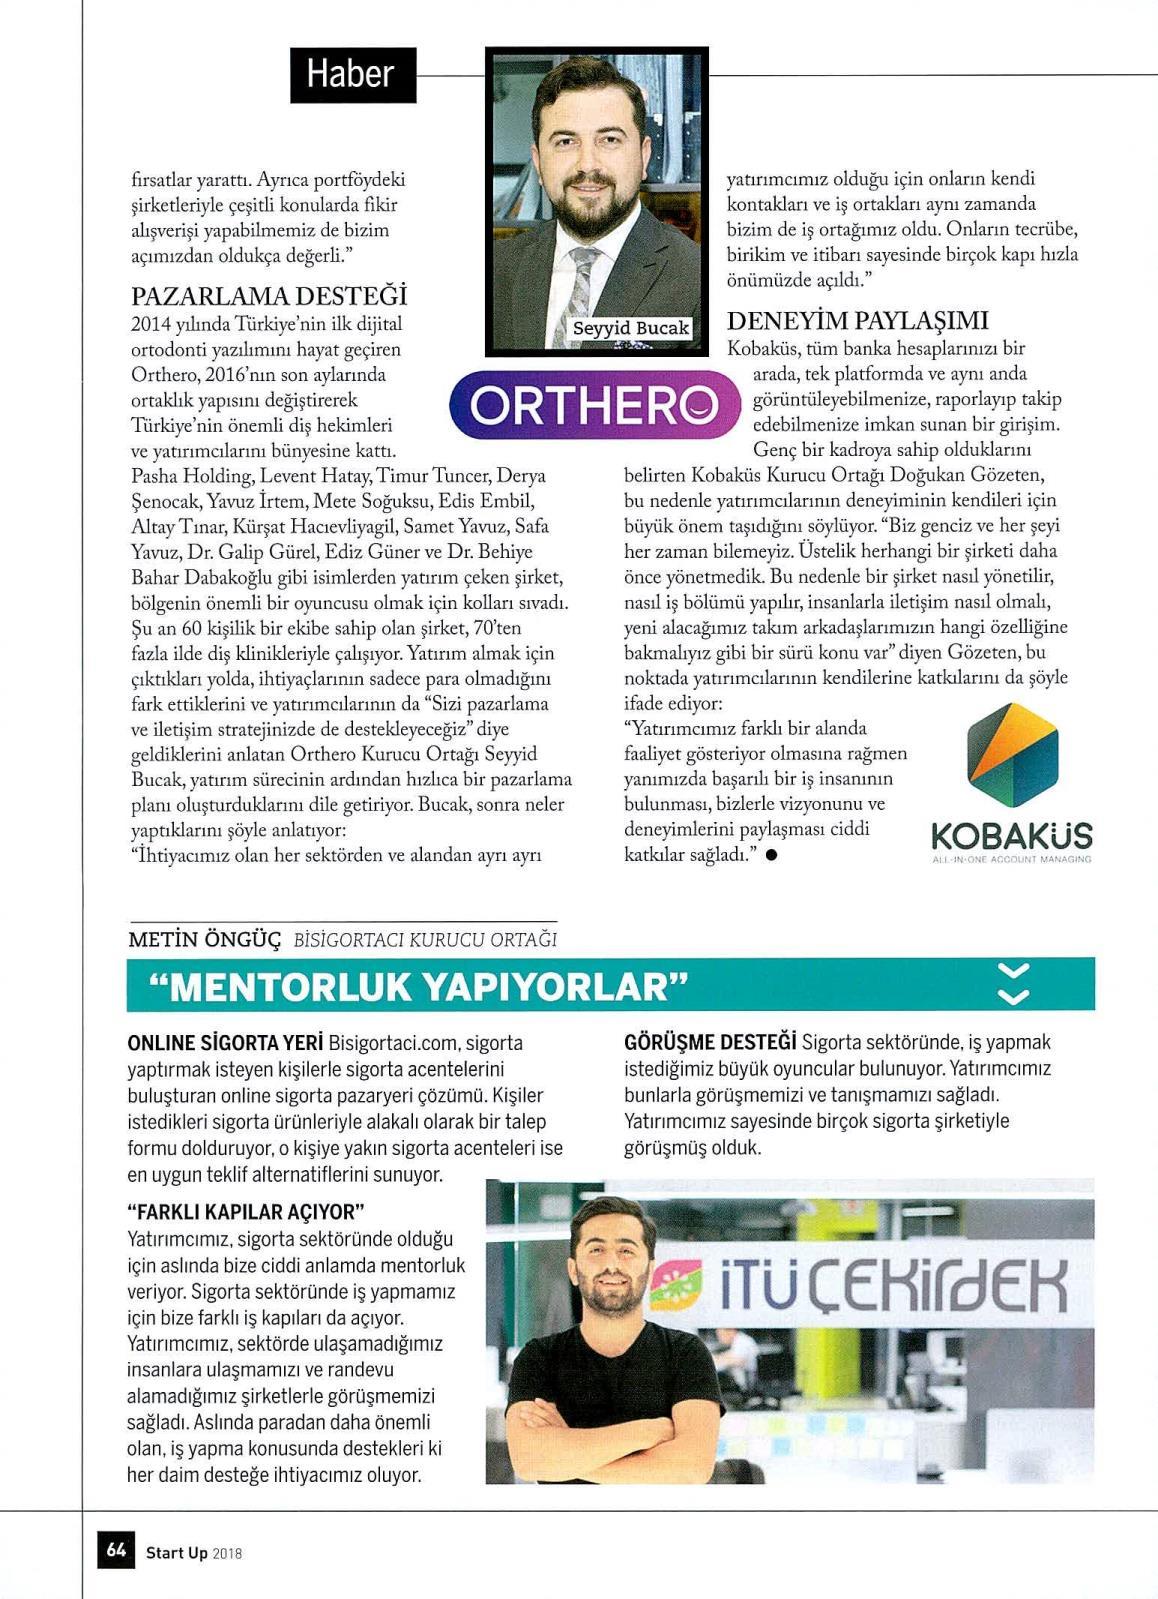 Capital_Start Up Dergisi_Kasım 2018_2